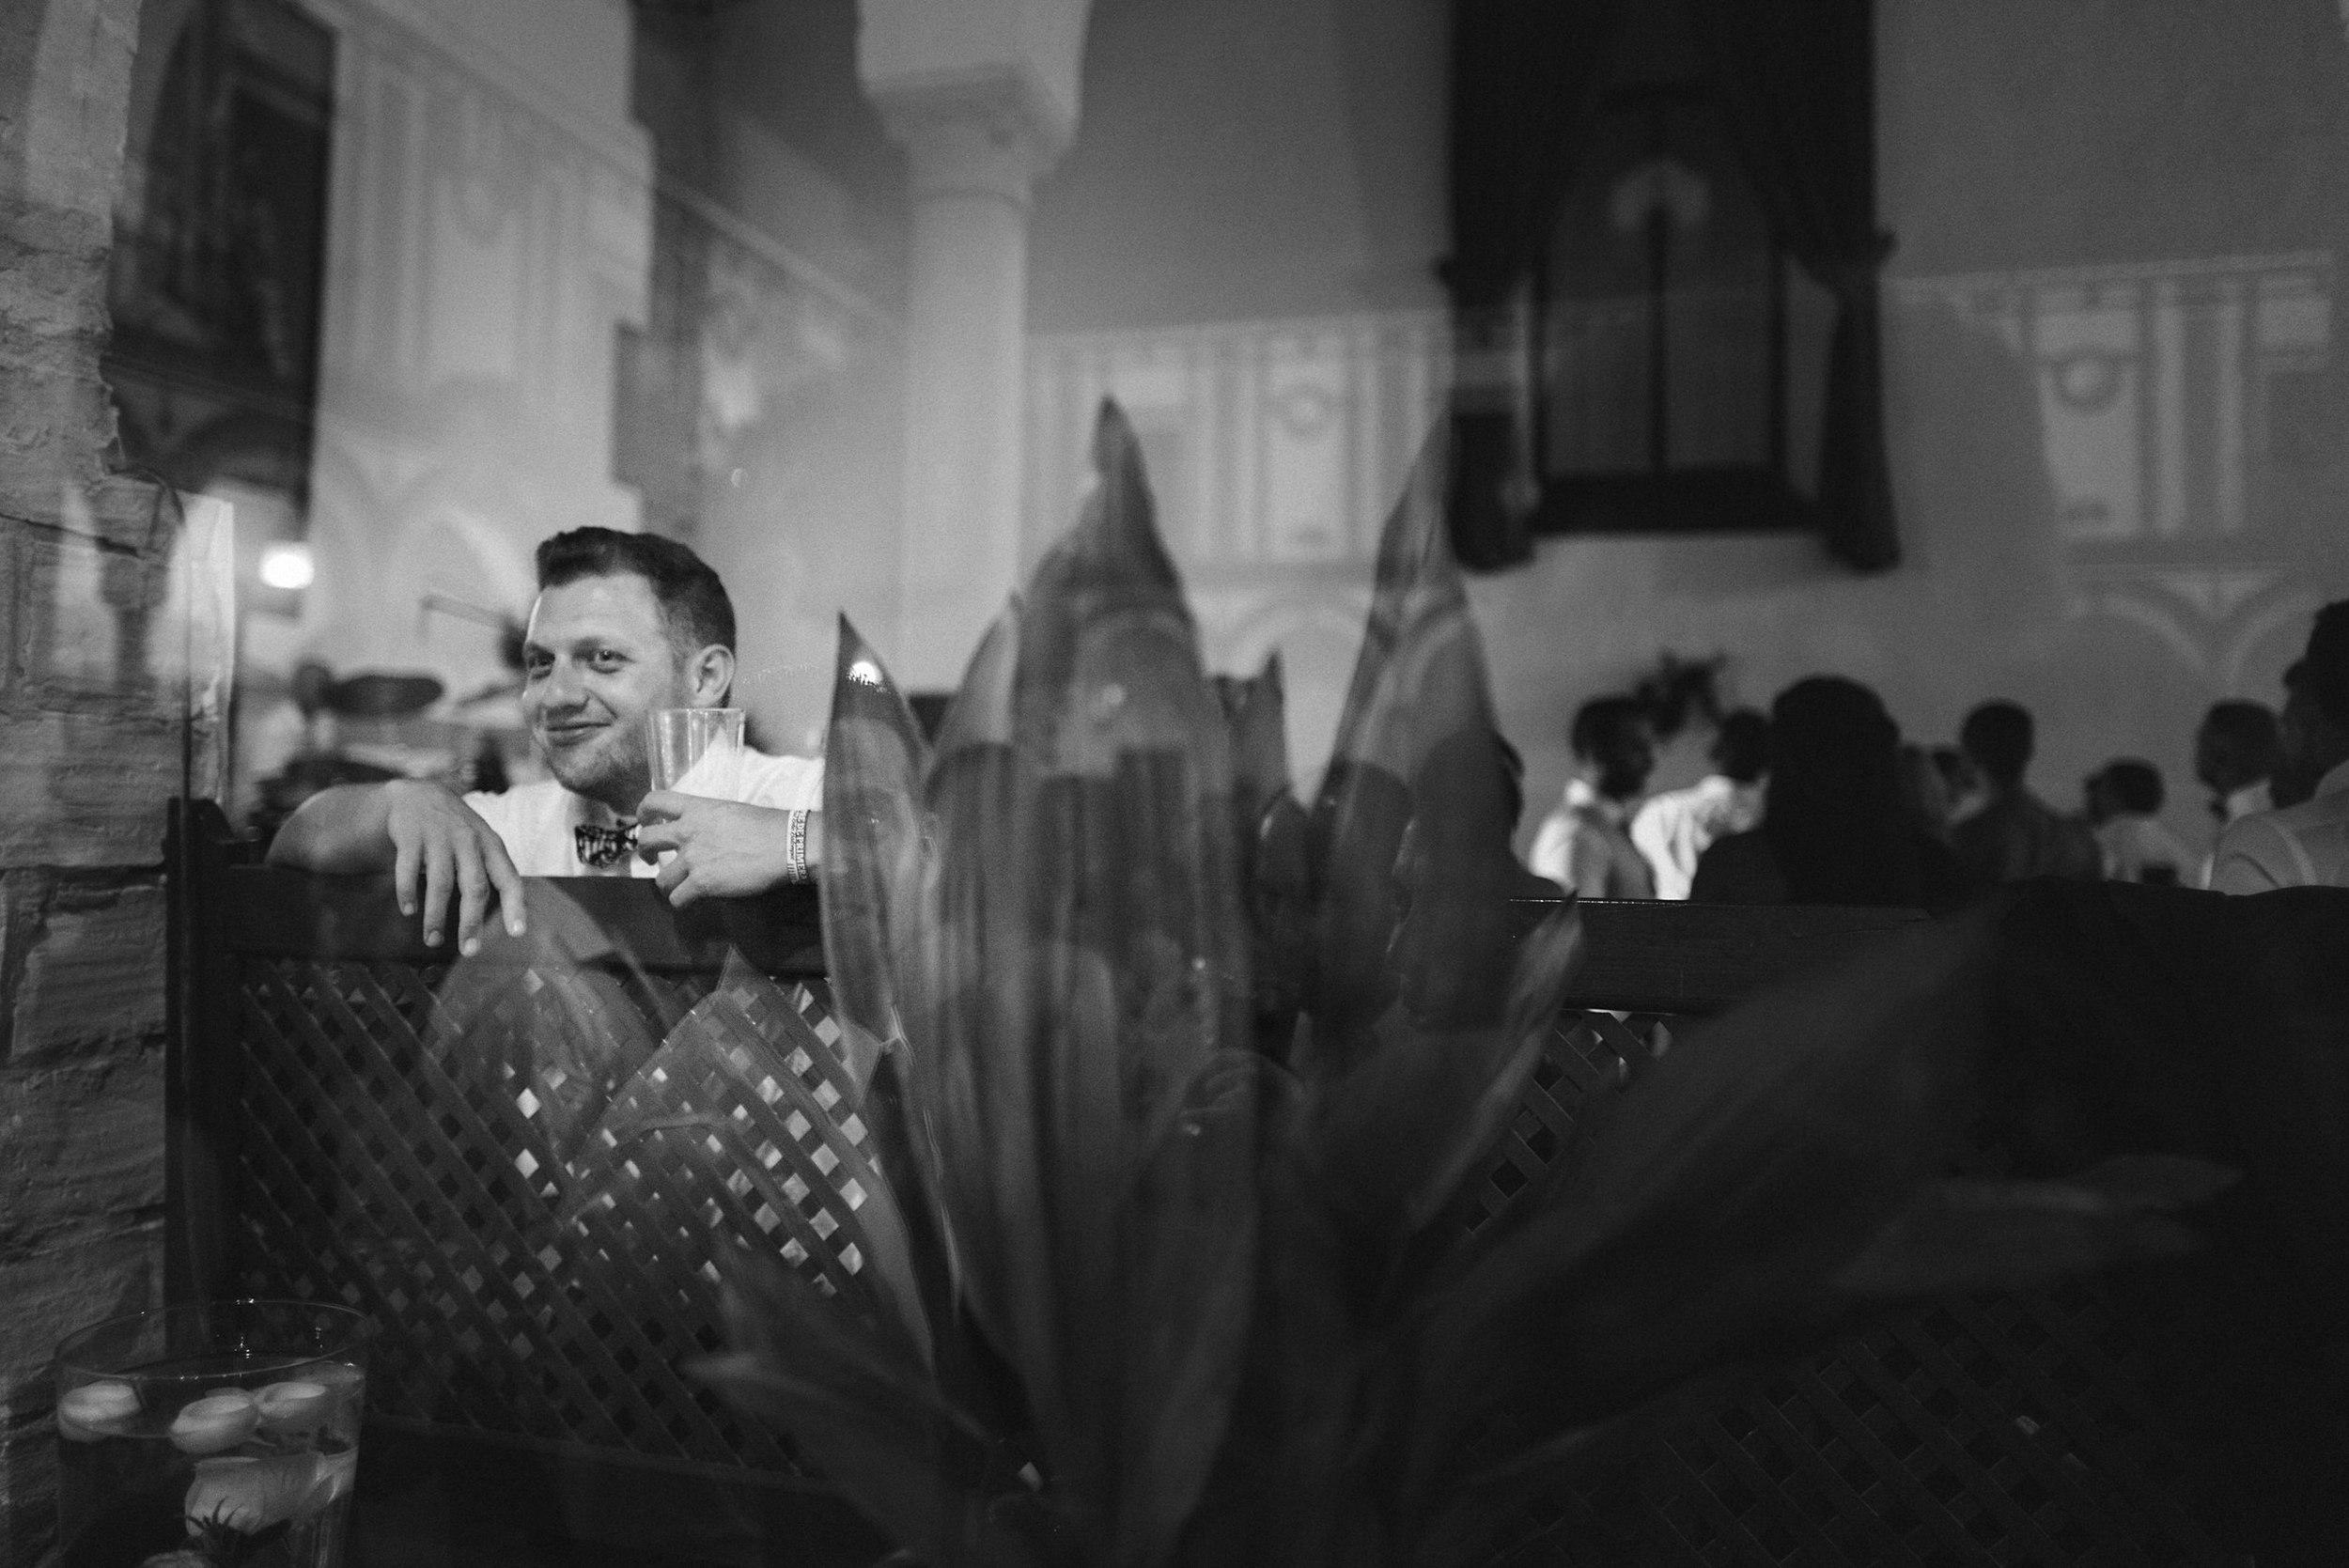 Boda en Utrera - Sevilla - Consolacion - Santuario - Alicia & Jesus DSC_5336-2exposure.jpg